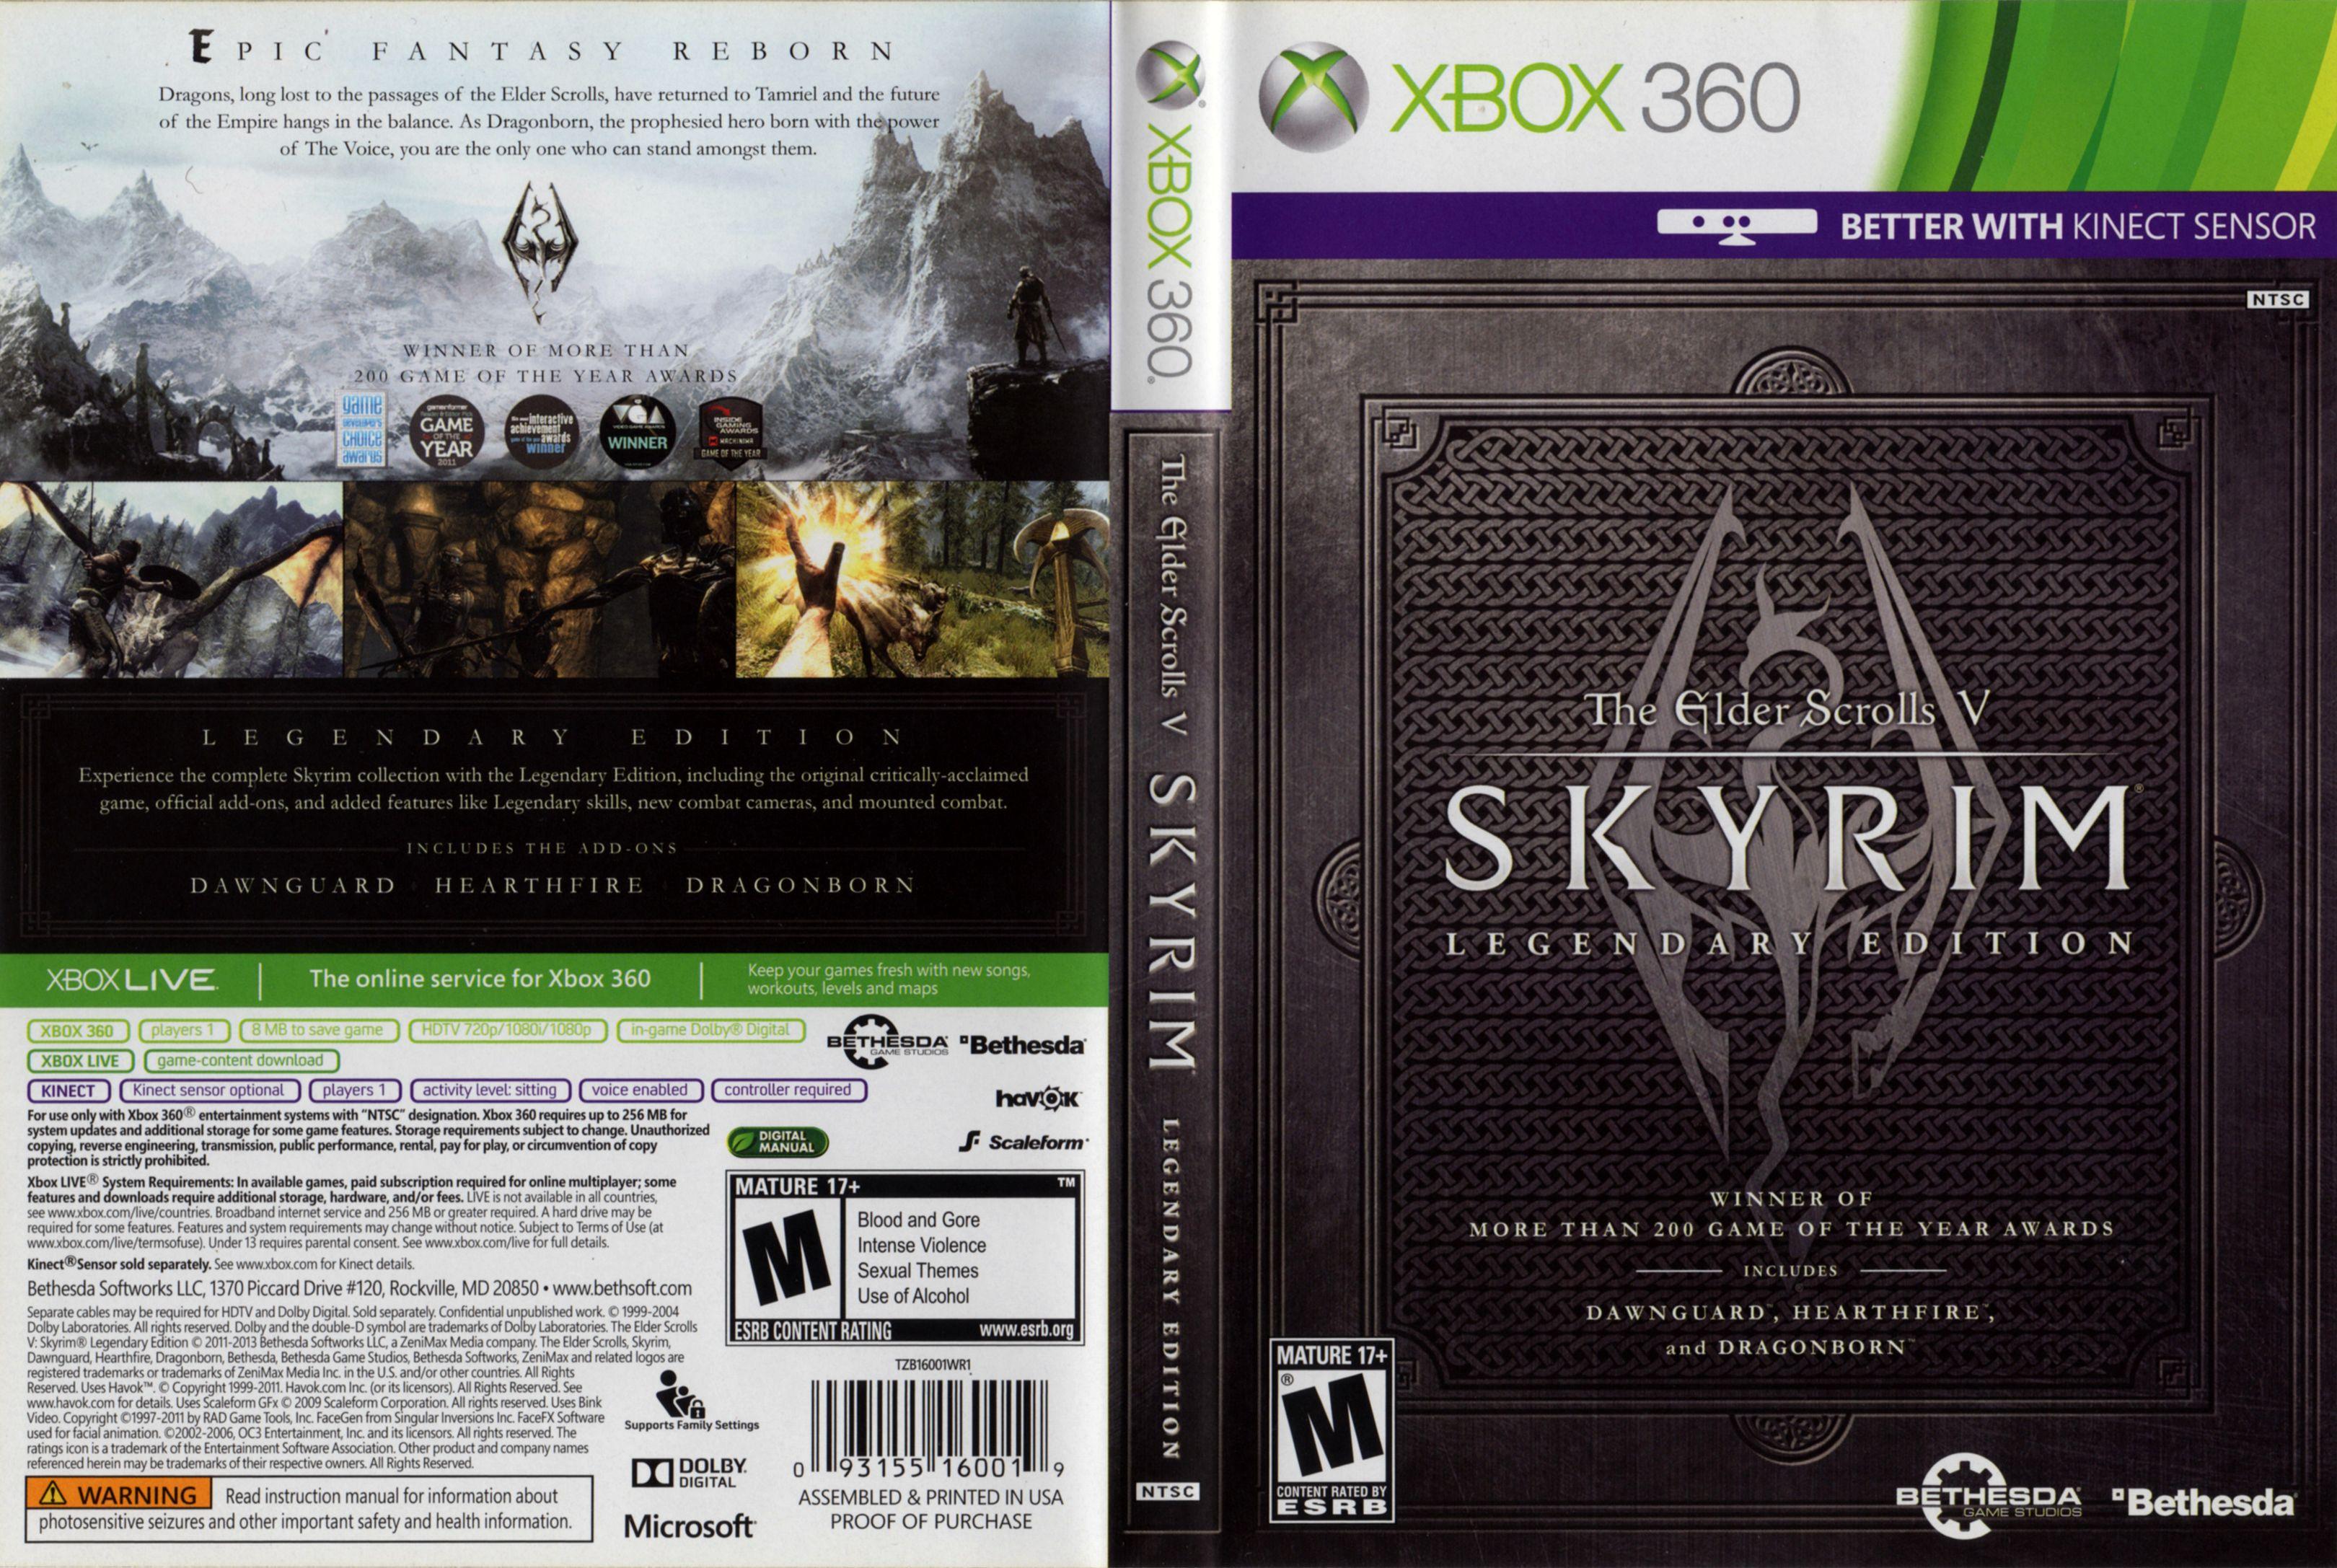 How Many Discs Is Skyrim Legendary Edition Worth